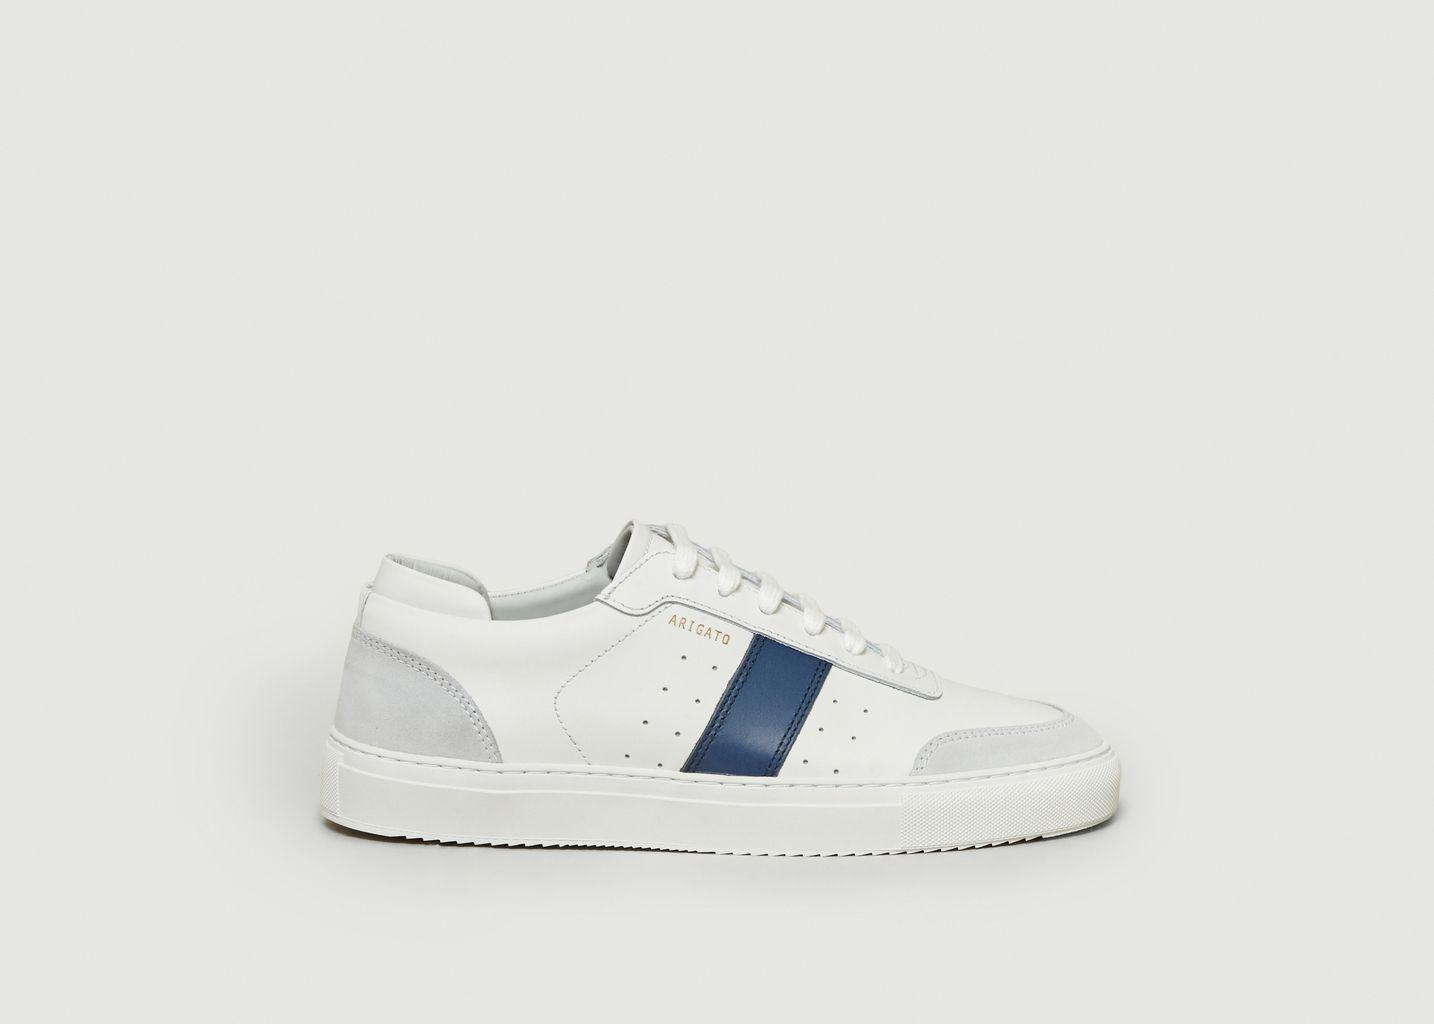 Sneakers Dunk - Axel Arigato